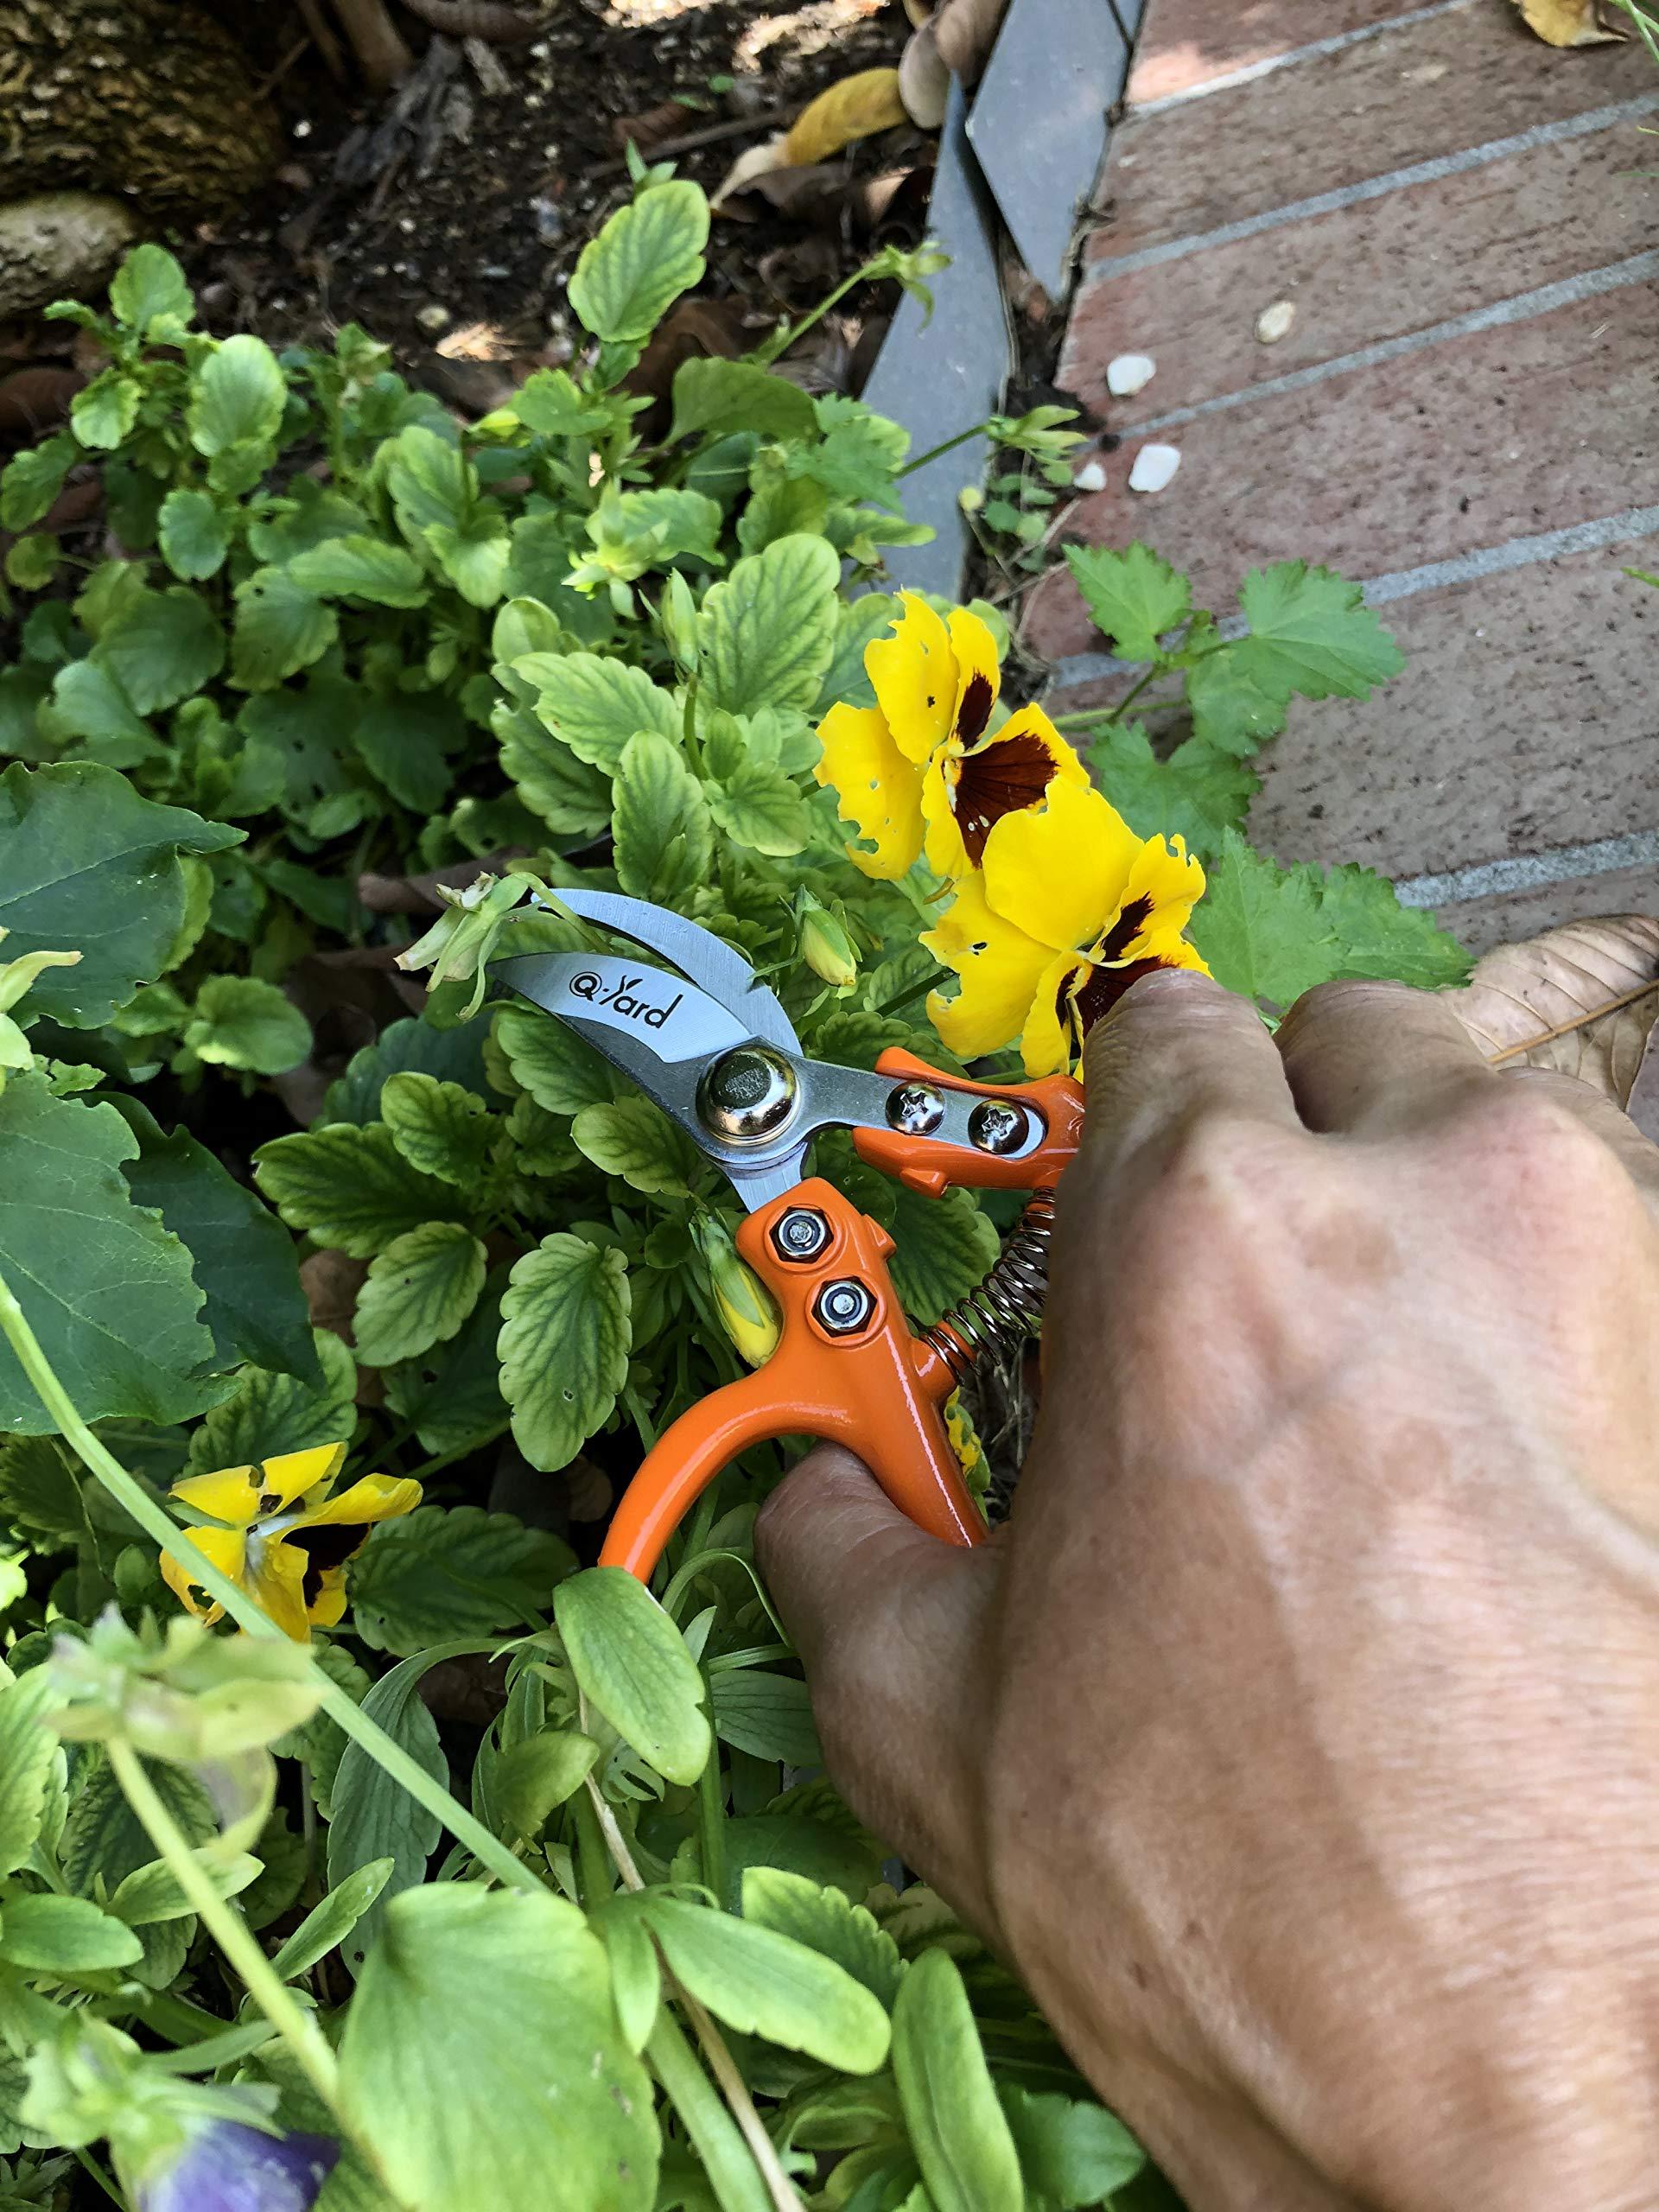 2 - pack Q-yard Pruning Shear, Mini- Extra Sharp Garden Hand Pruners, Easier Cutting, Comfortable Ergonomic, Less Effort - Gardening Scissors for Men & Women by Q-yard